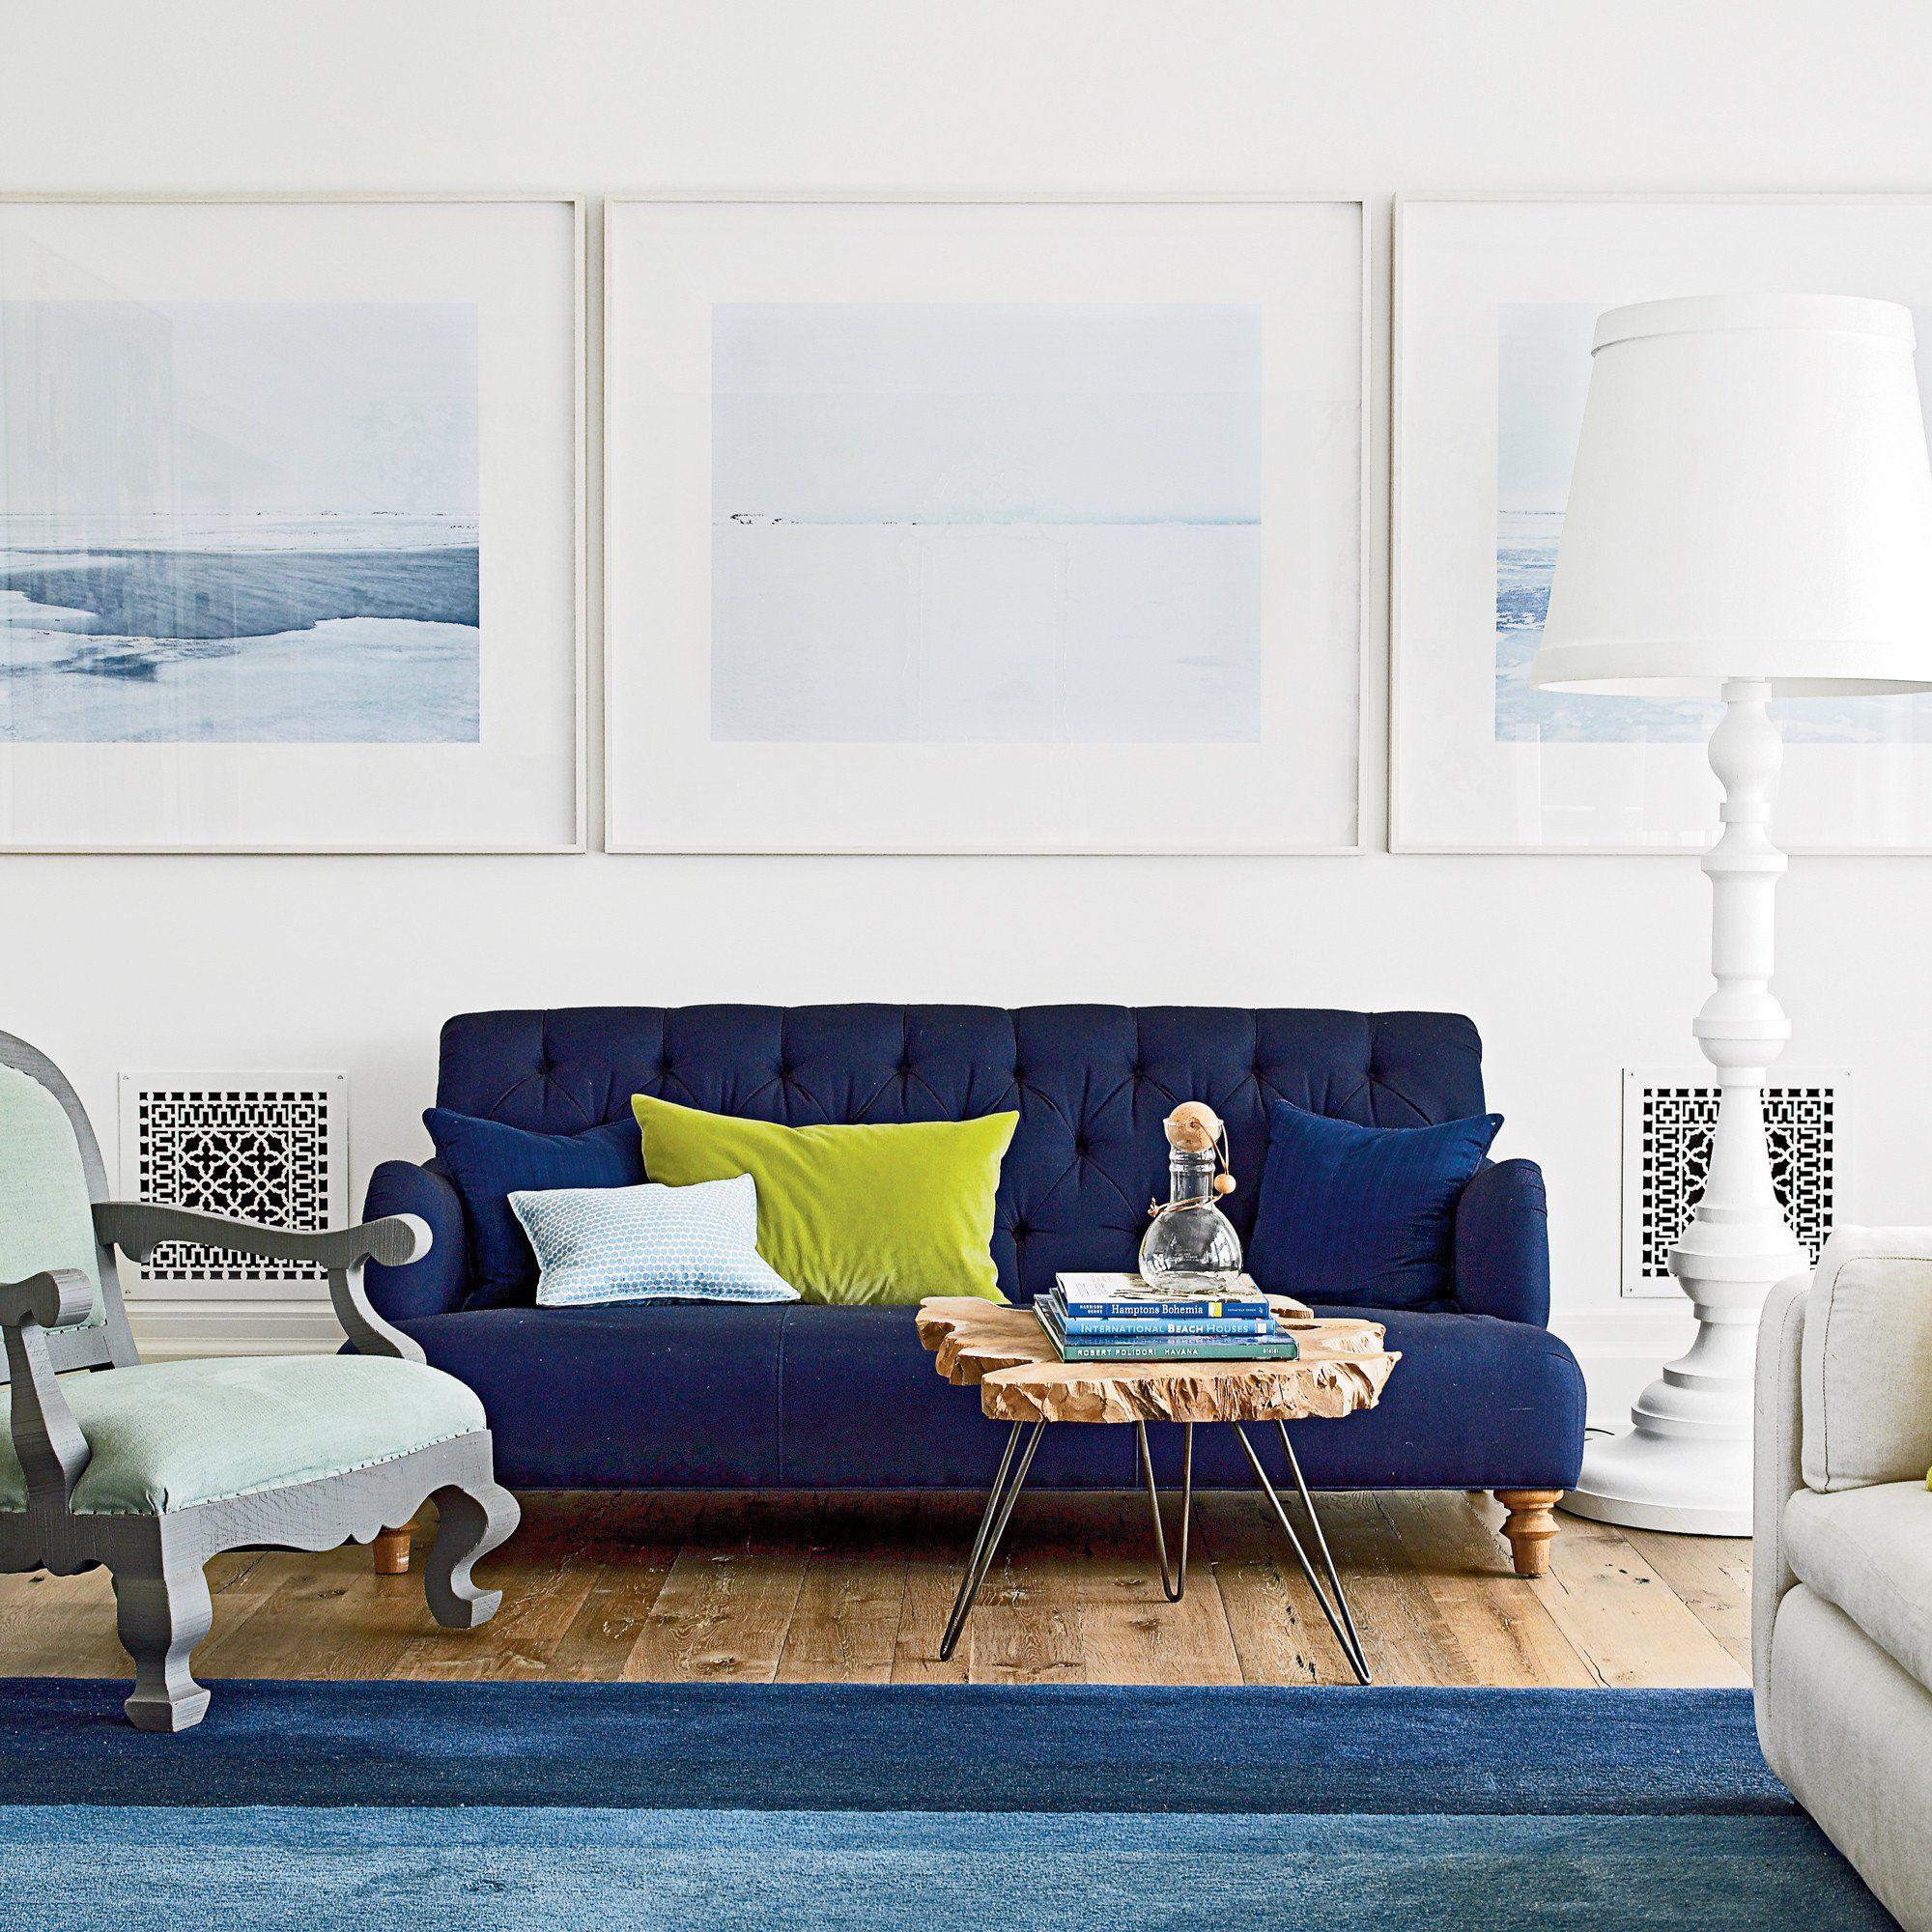 Coastal Living Paint Colors Pick The Perfect Living Room Color Palette Living Room Color Schemes Living Room Decor Colors Blue Couch Living Room